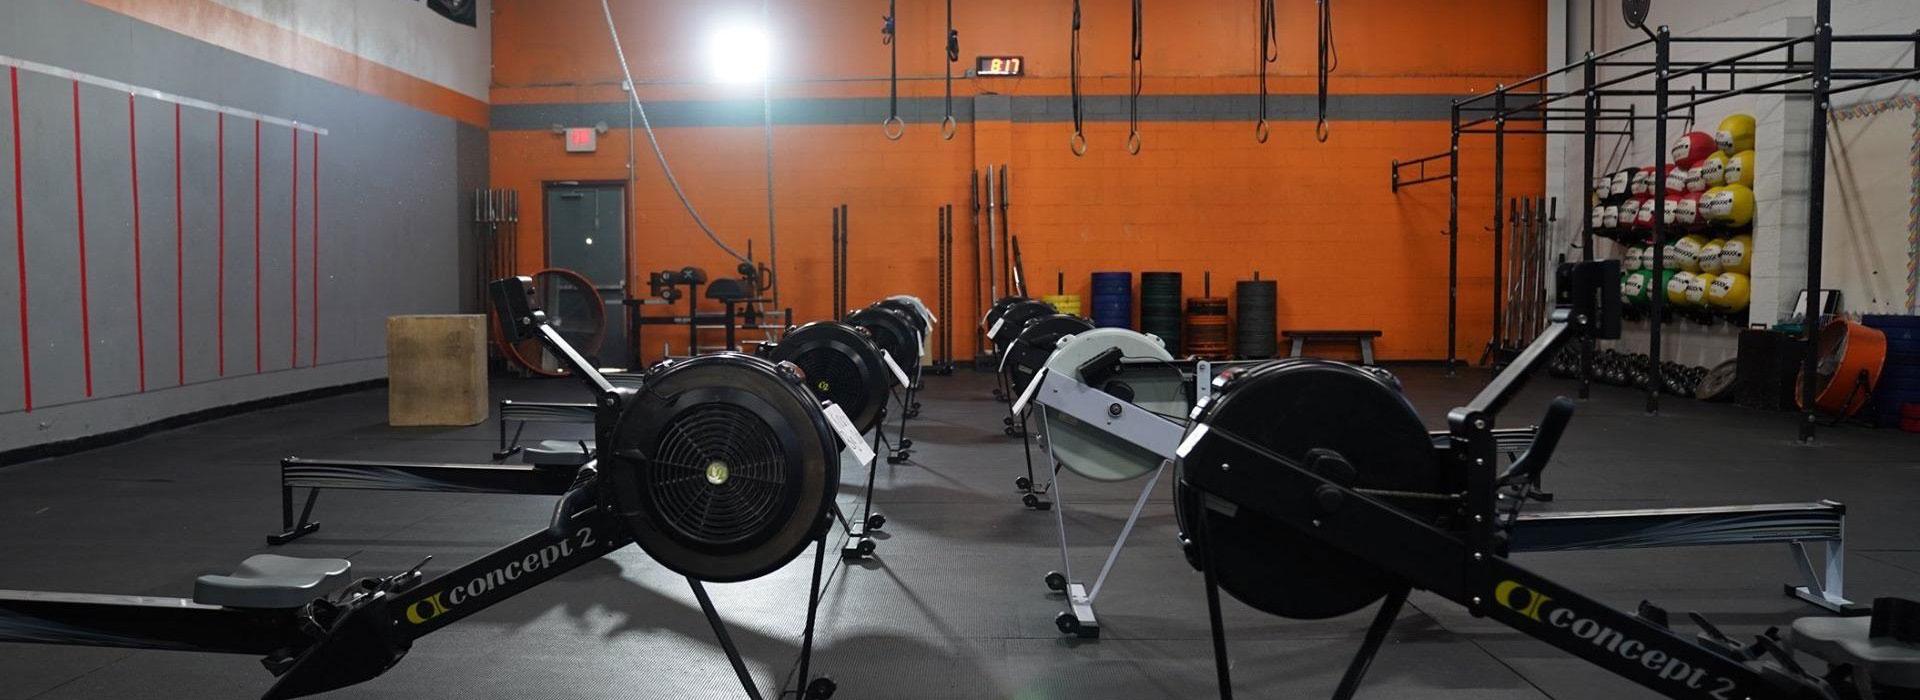 Fitness Gym near North Burnswick NJ, Fitness Gym near New Burnswick NJ, Fitness Gym near East Burnswick NJ, Fitness Gym near Milltown NJ, Fitness Gym near Franklin Township NJ